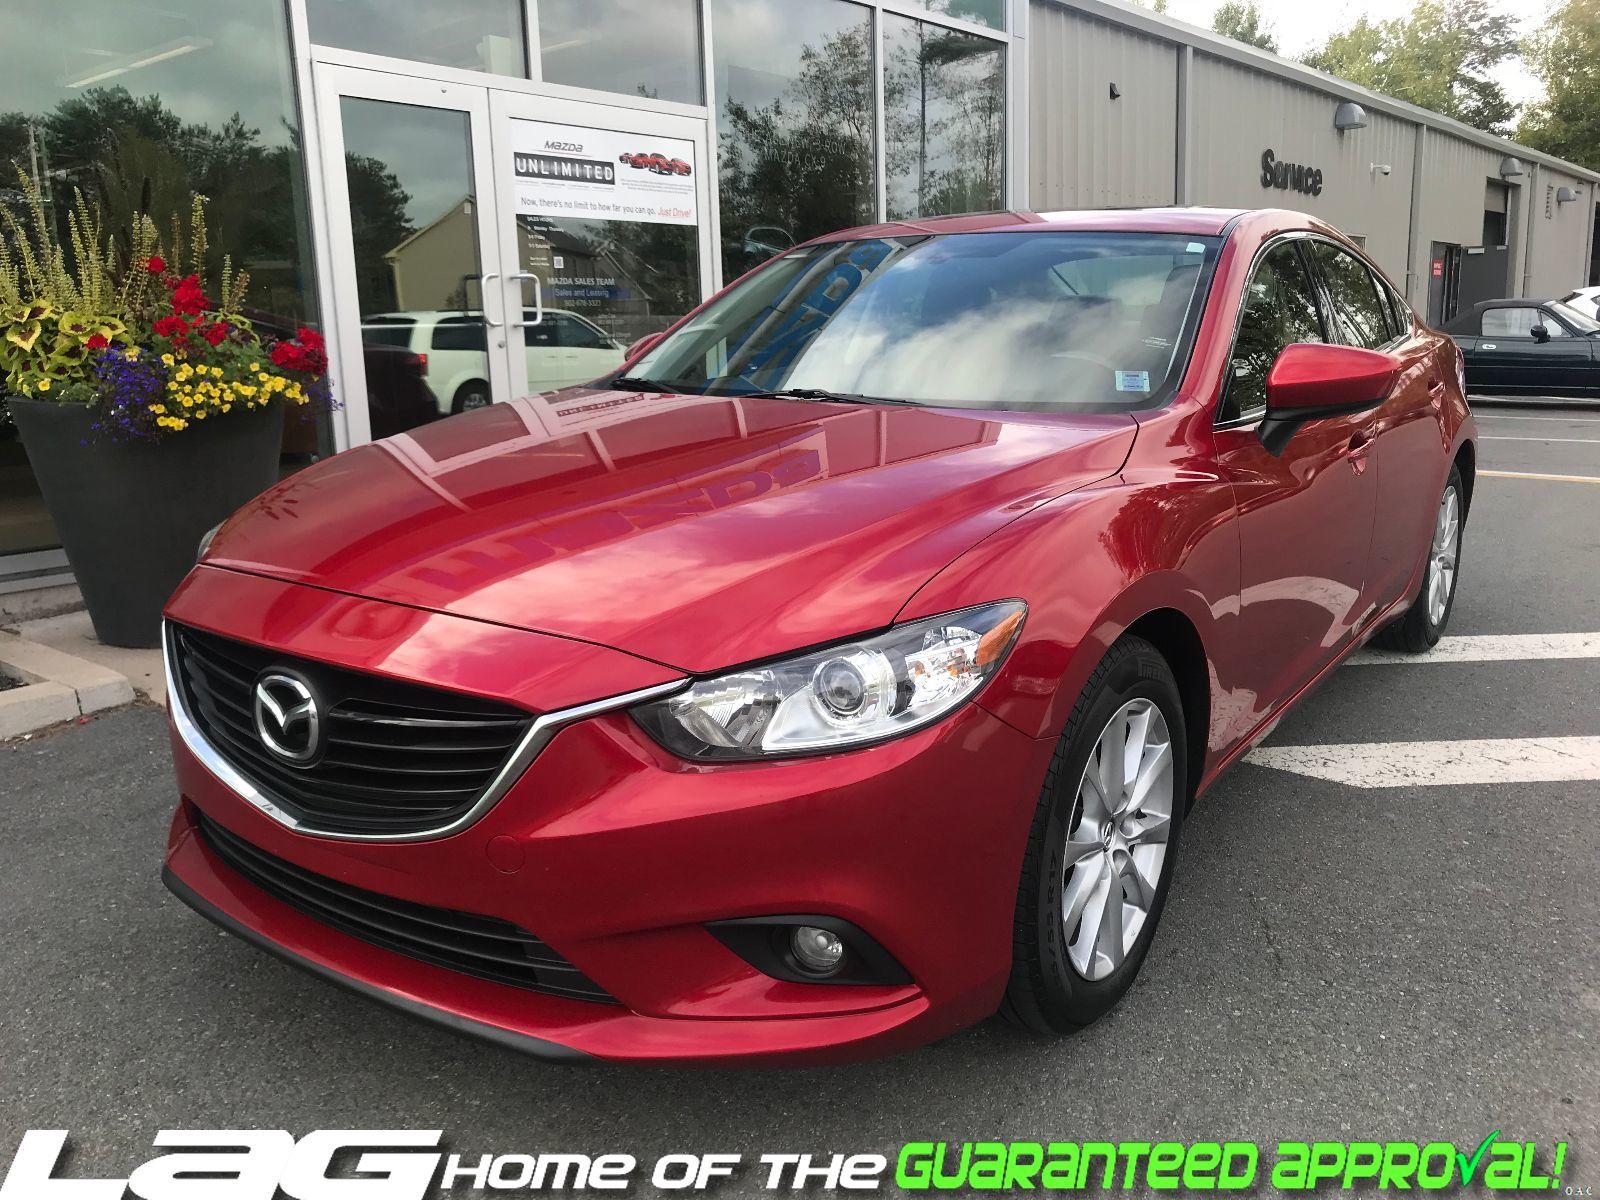 Used 2015 Mazda Mazda6 GS in Kentville Used inventory Kentville